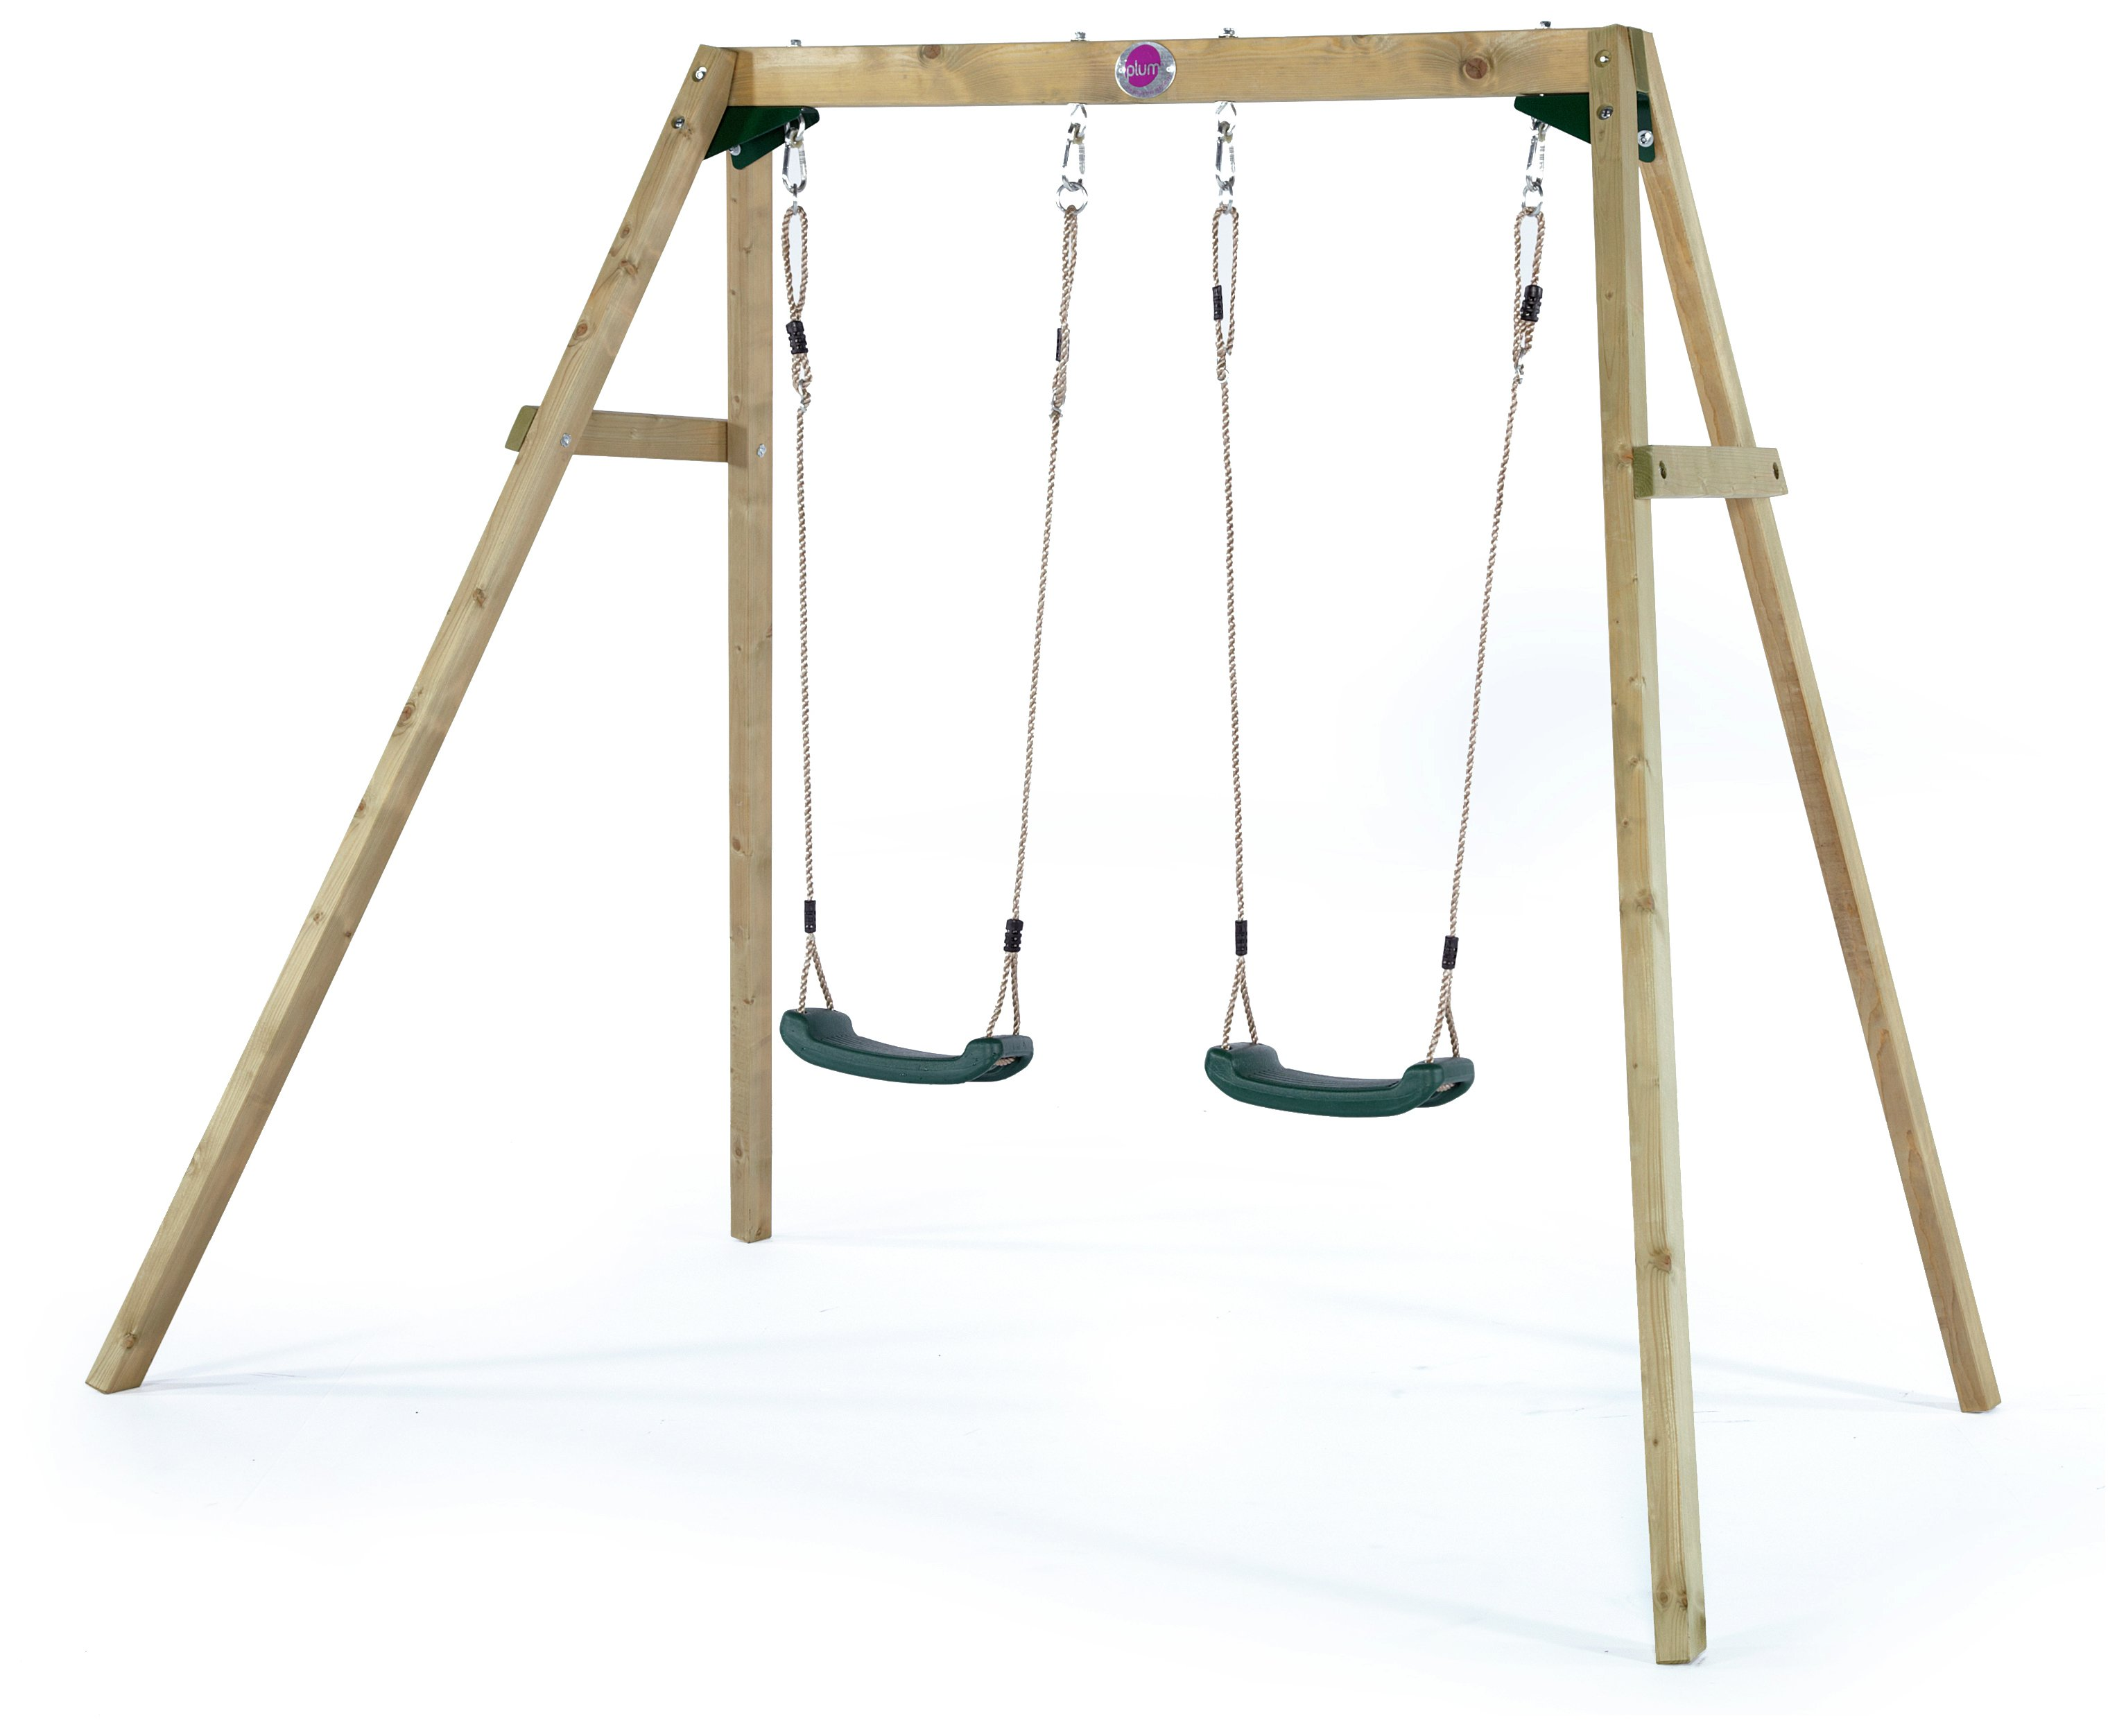 Plum Wooden Double Swing Set.